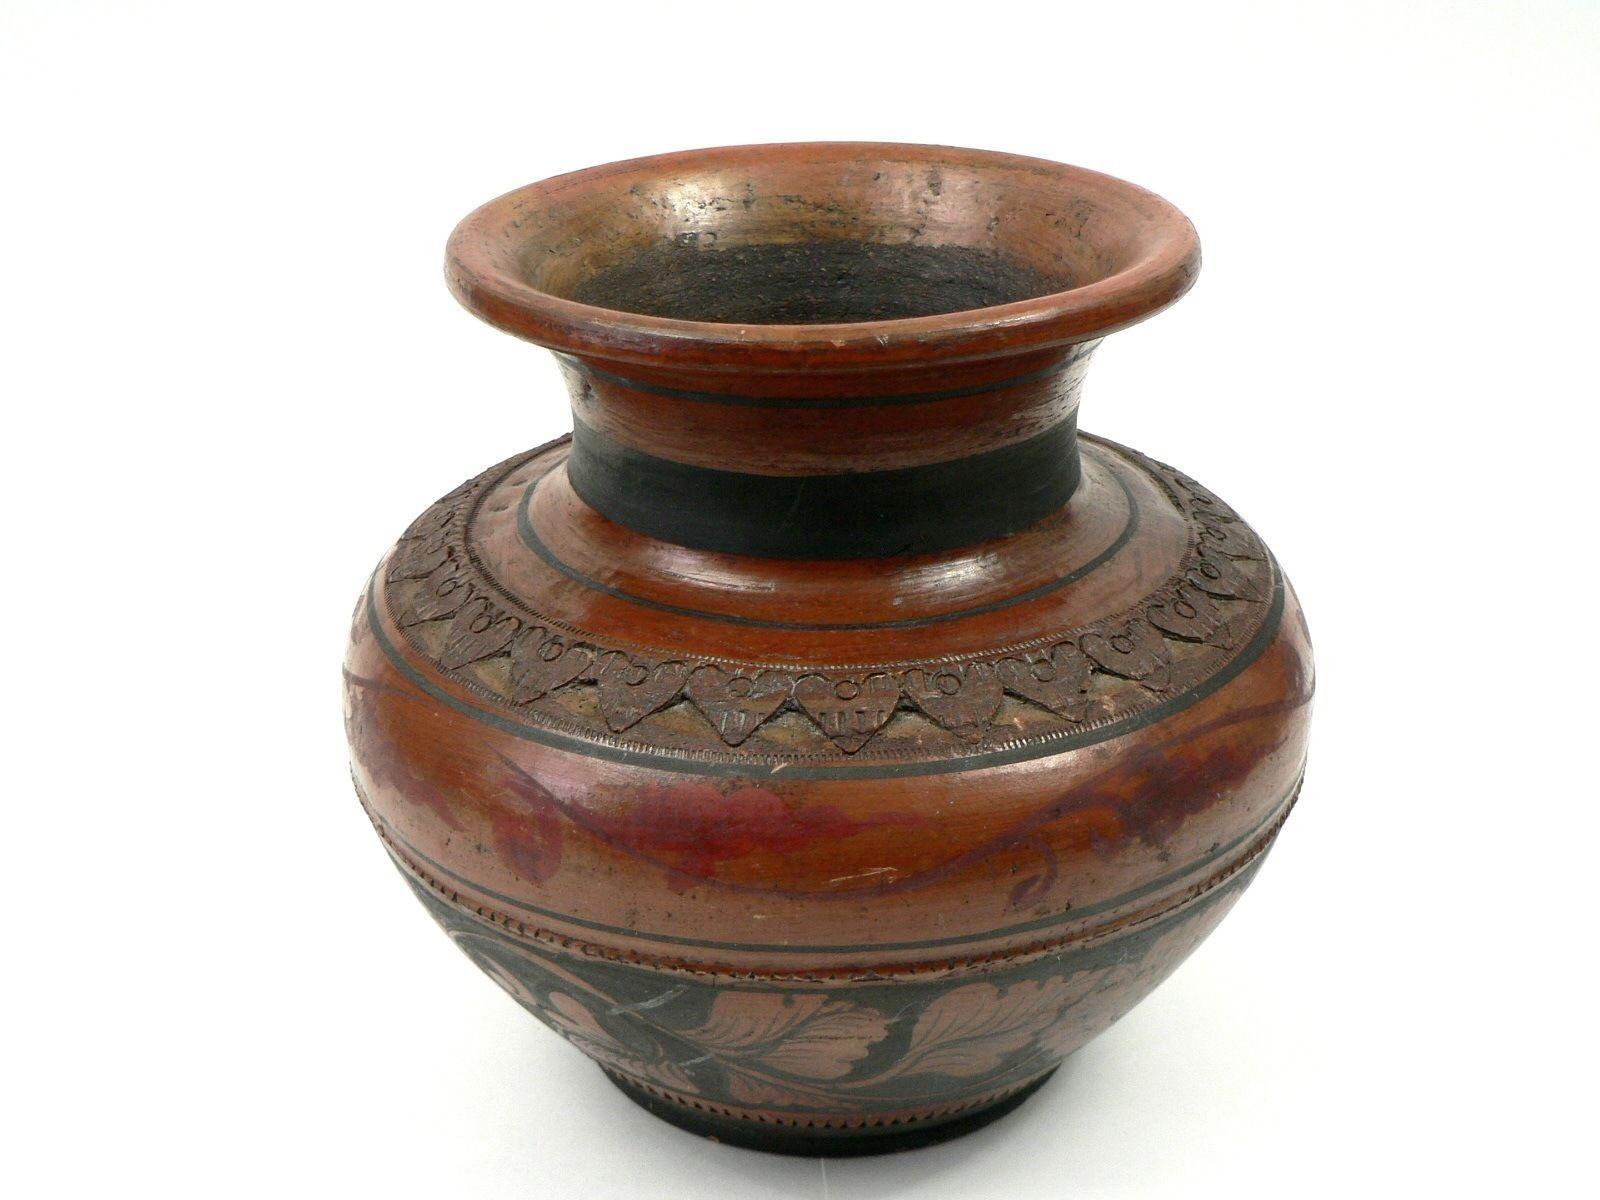 "Vtg Reddish Brown Pottery Vase w Black & Red Floral Paint & Carved Hearts 9""X9"" - $30.00"